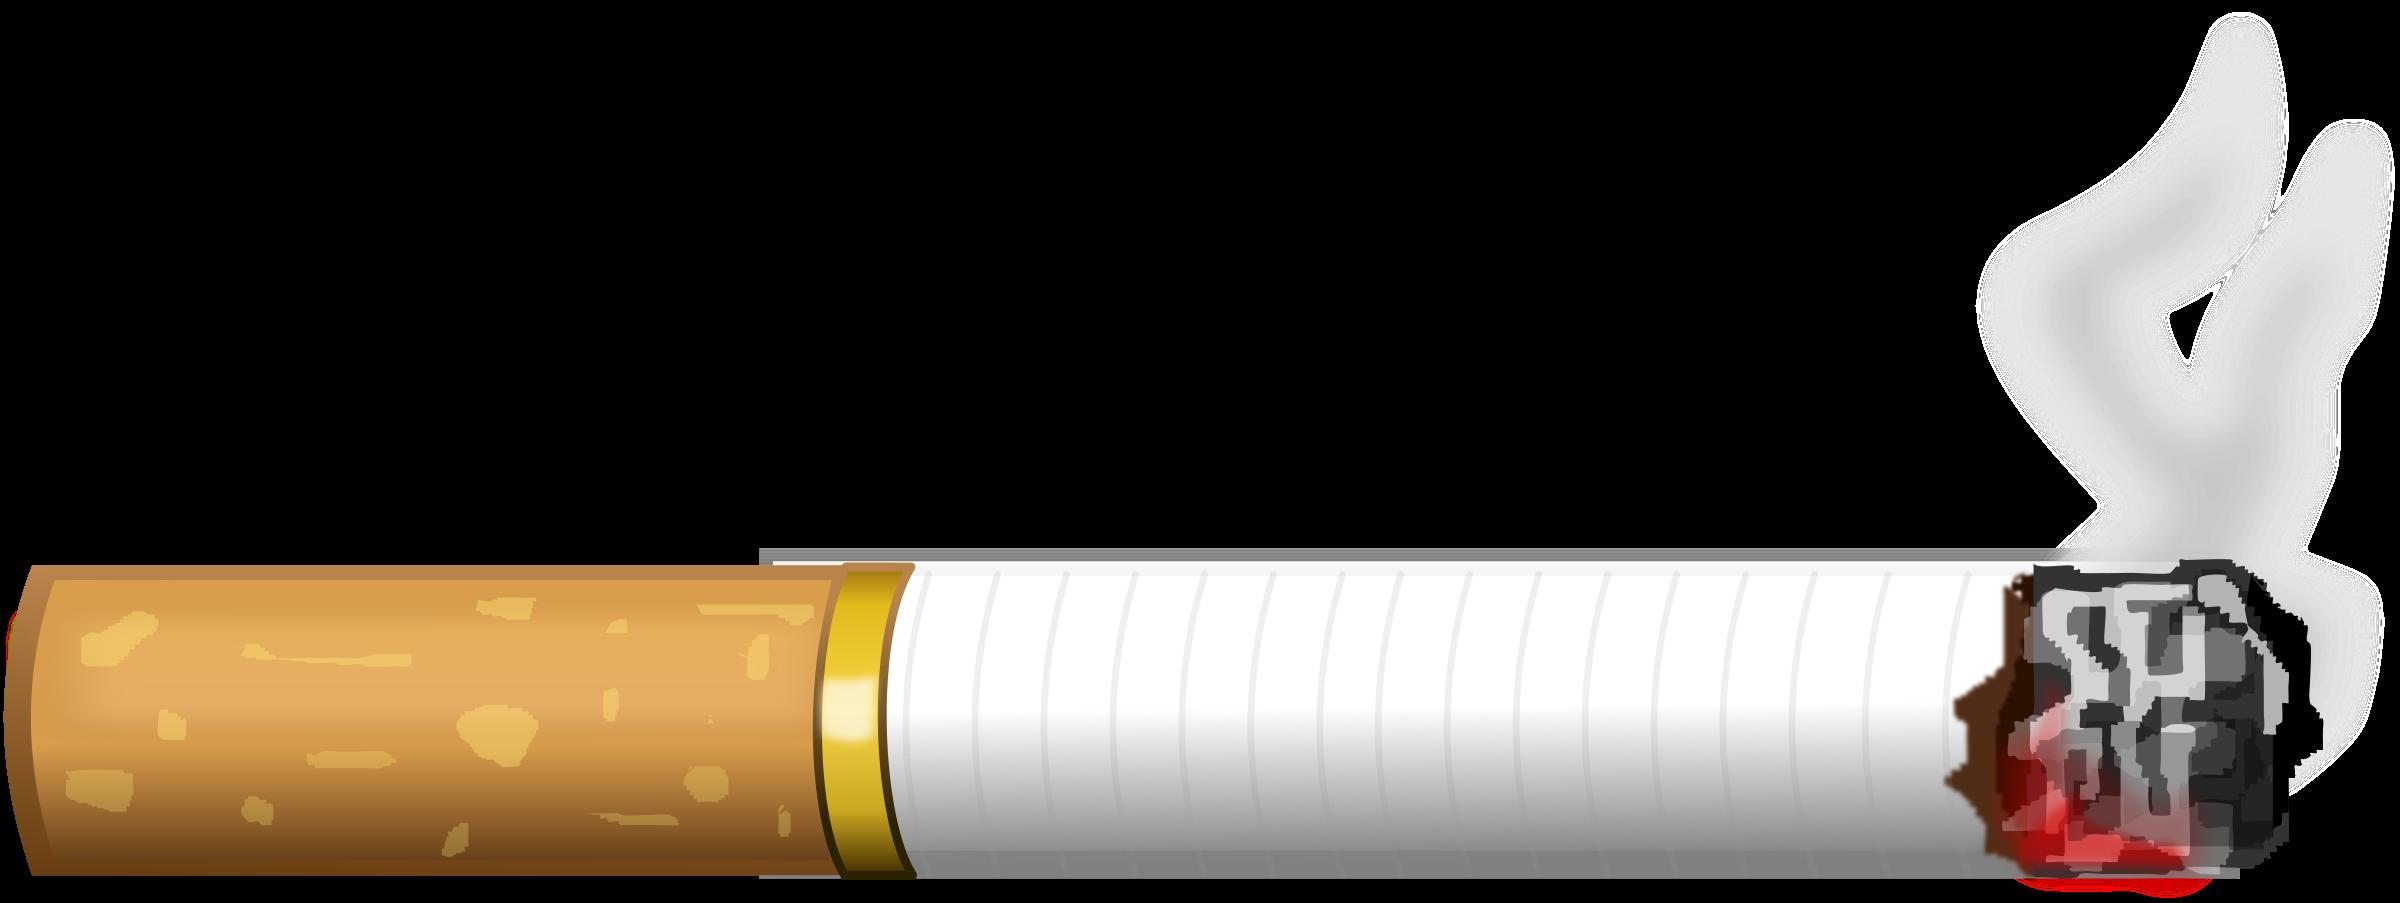 Cigar clipart blunt. Cigarette clip art free